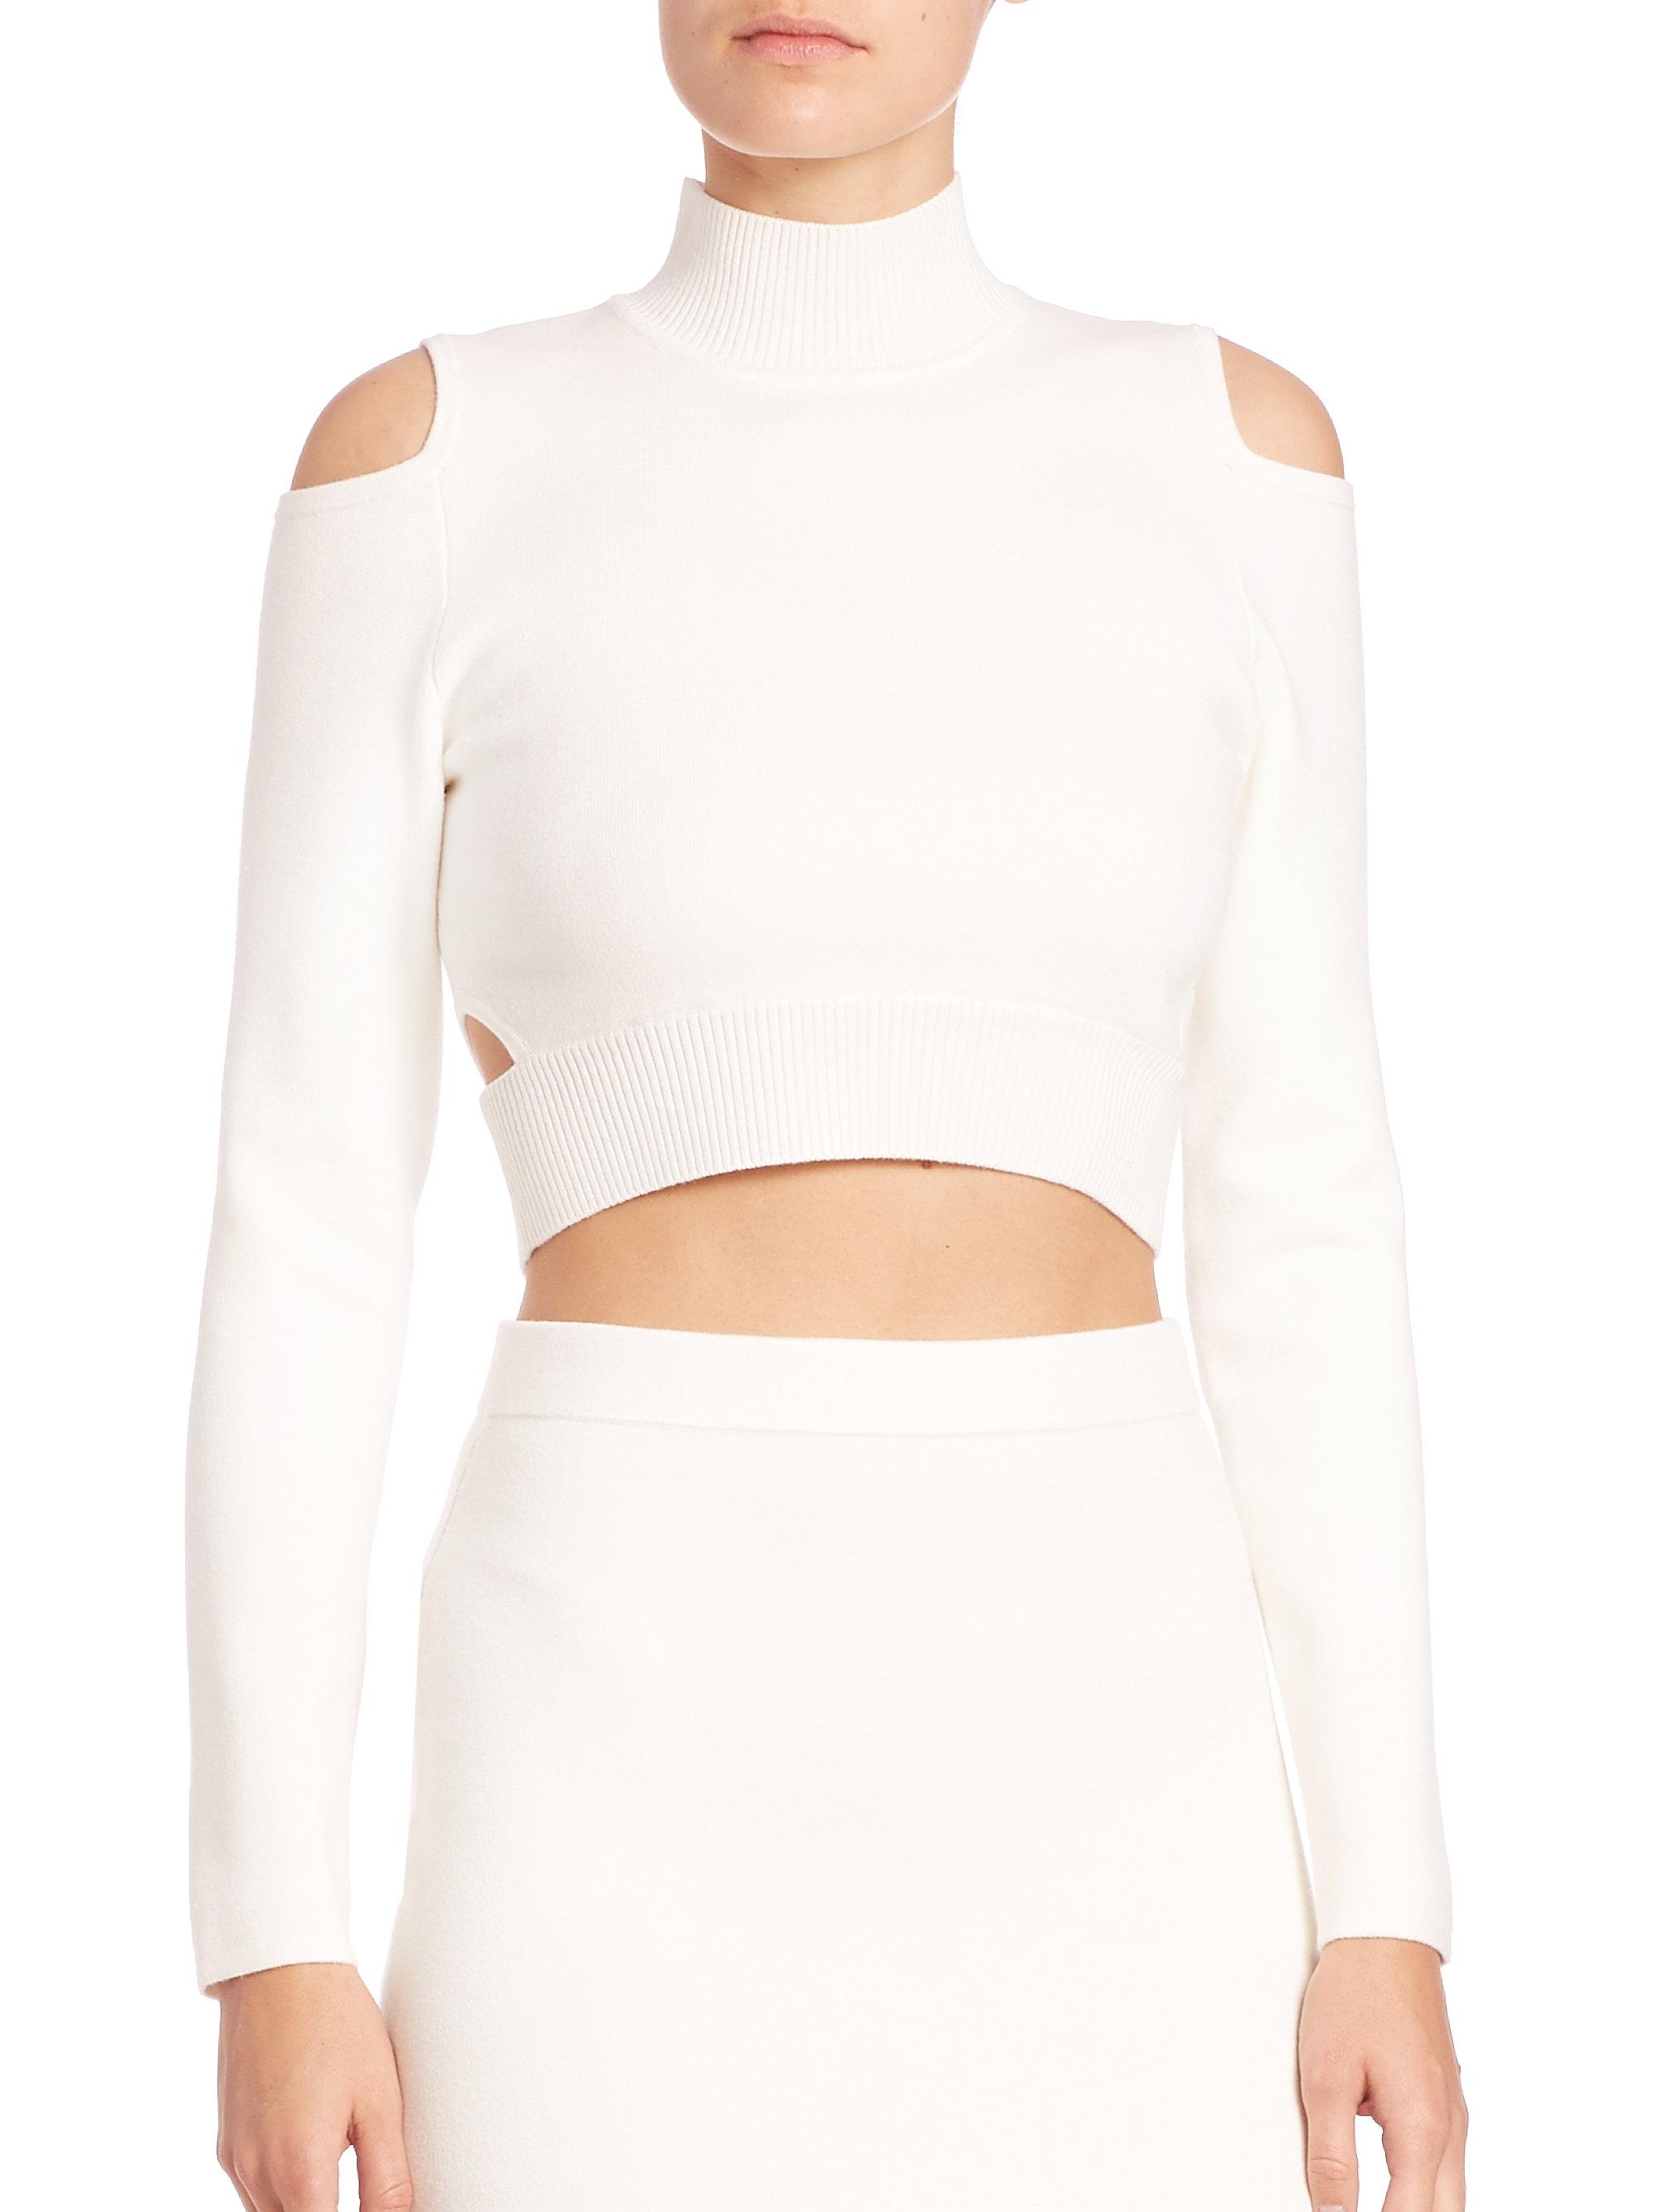 Jonathan simkhai Cutout Cropped Turtleneck Sweater in White | Lyst